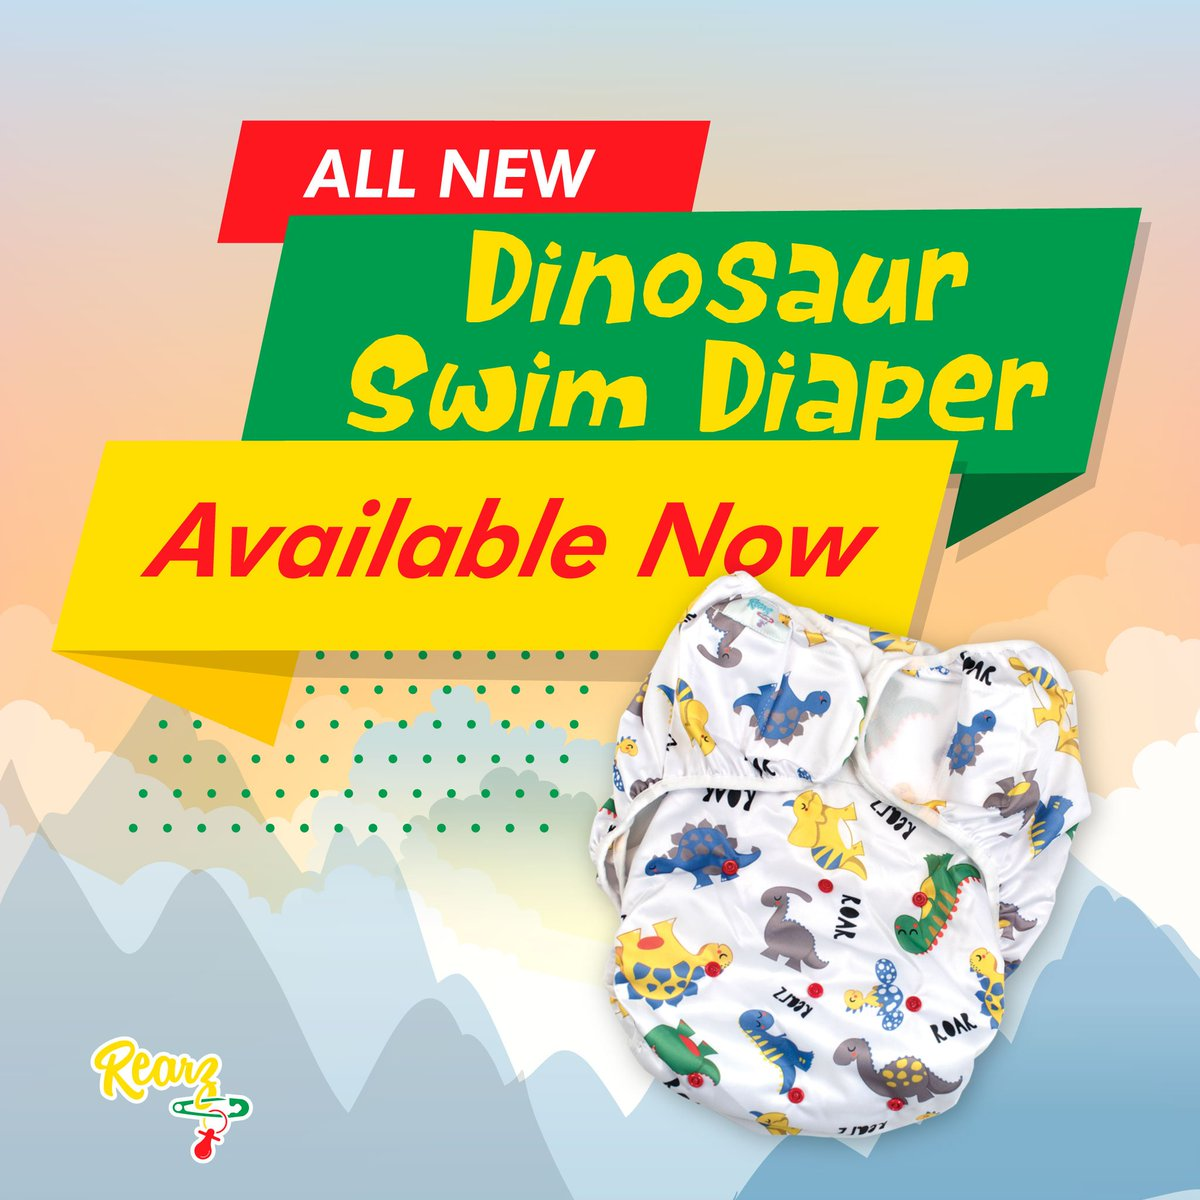 Our All New Dinosaur Swim Diaper is here: https://t.co/JZsZgch270  #rearz #rearzinc #rearzdiapers #adultdiapers #adultnappies #diaperfetish #adultbabydiaperlover #abdl #cglg #cglb #diaperbutt #incontinence #abdldiapers #adultbaby #diaperedbum https://t.co/onxmgcem0s